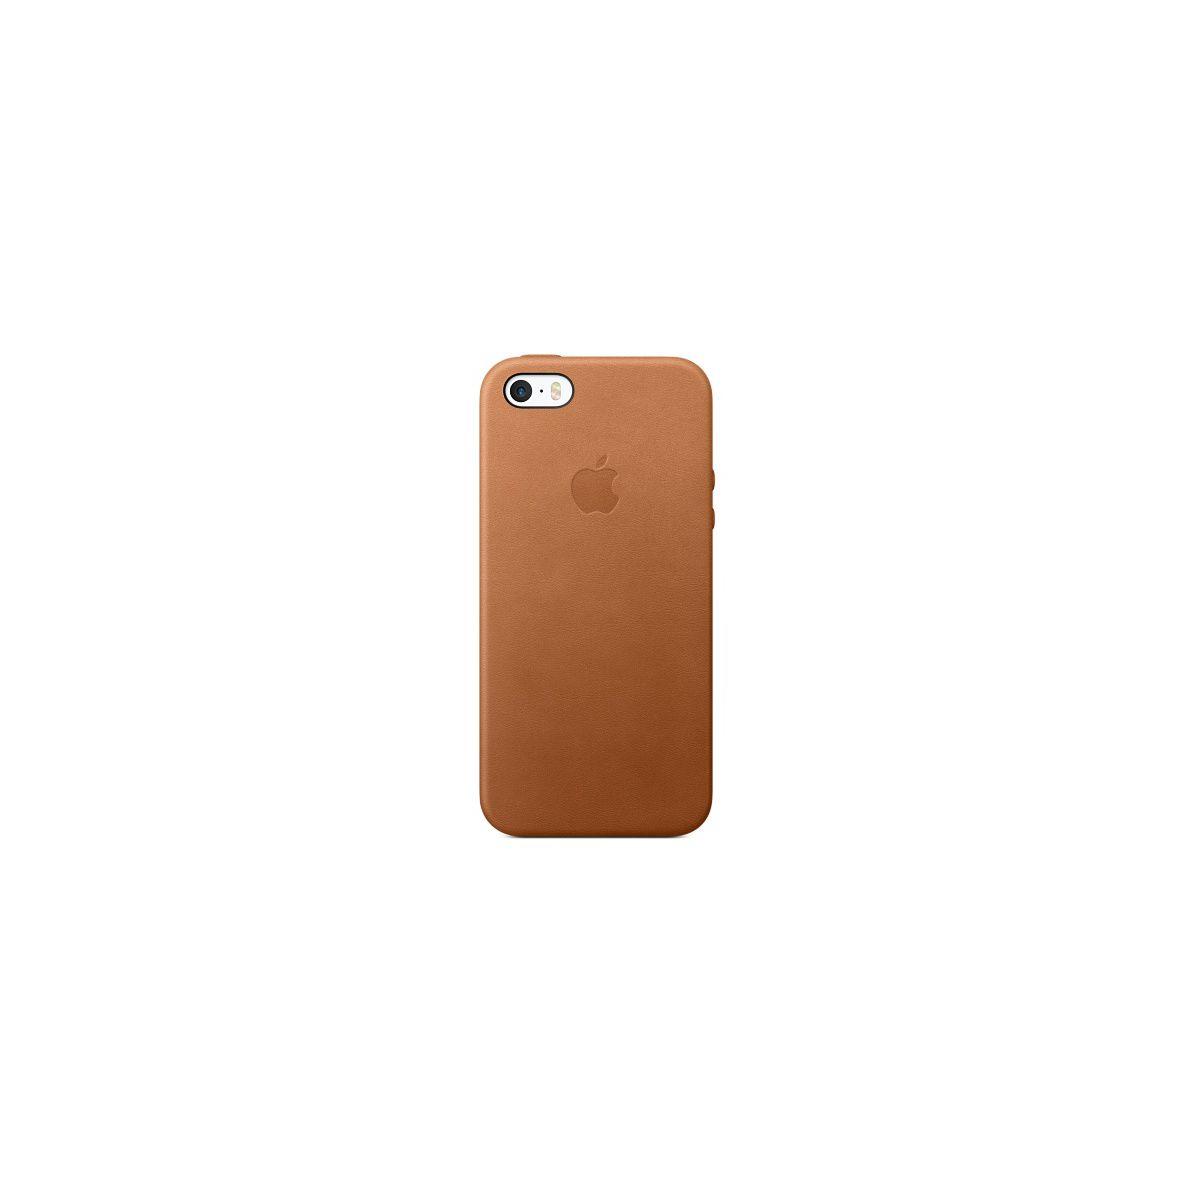 Coque APPLE iPhone SE cuir Havane (photo)